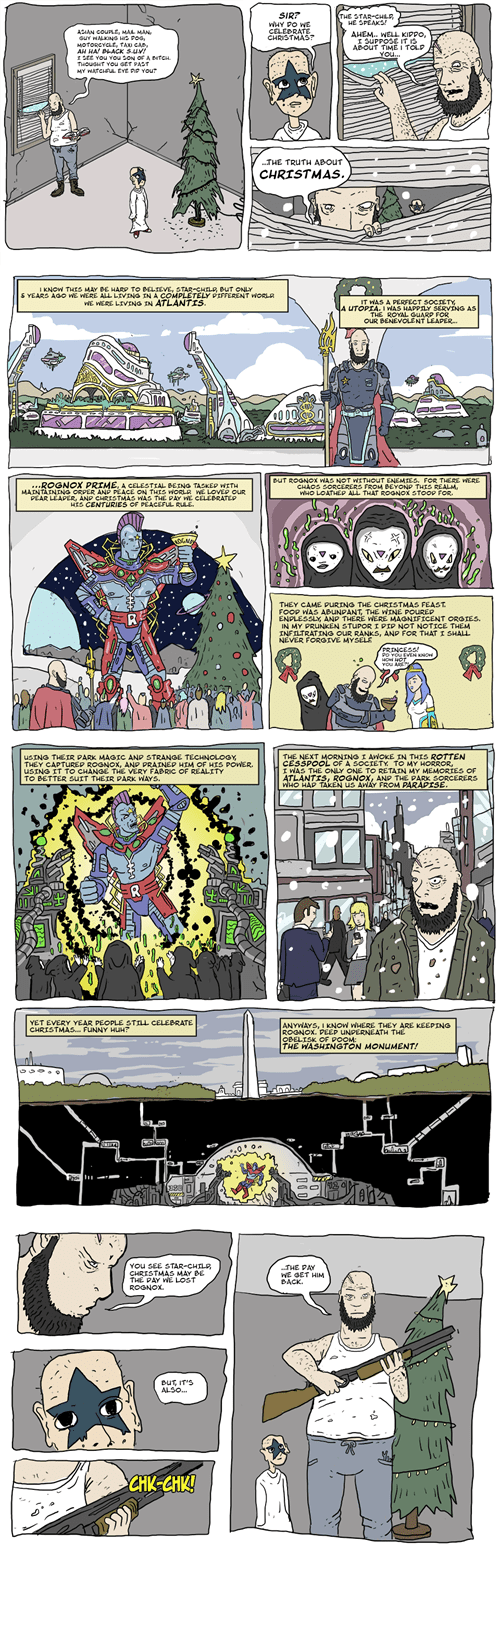 atlantis christmas mindwarp wtf web comics - 7971149824